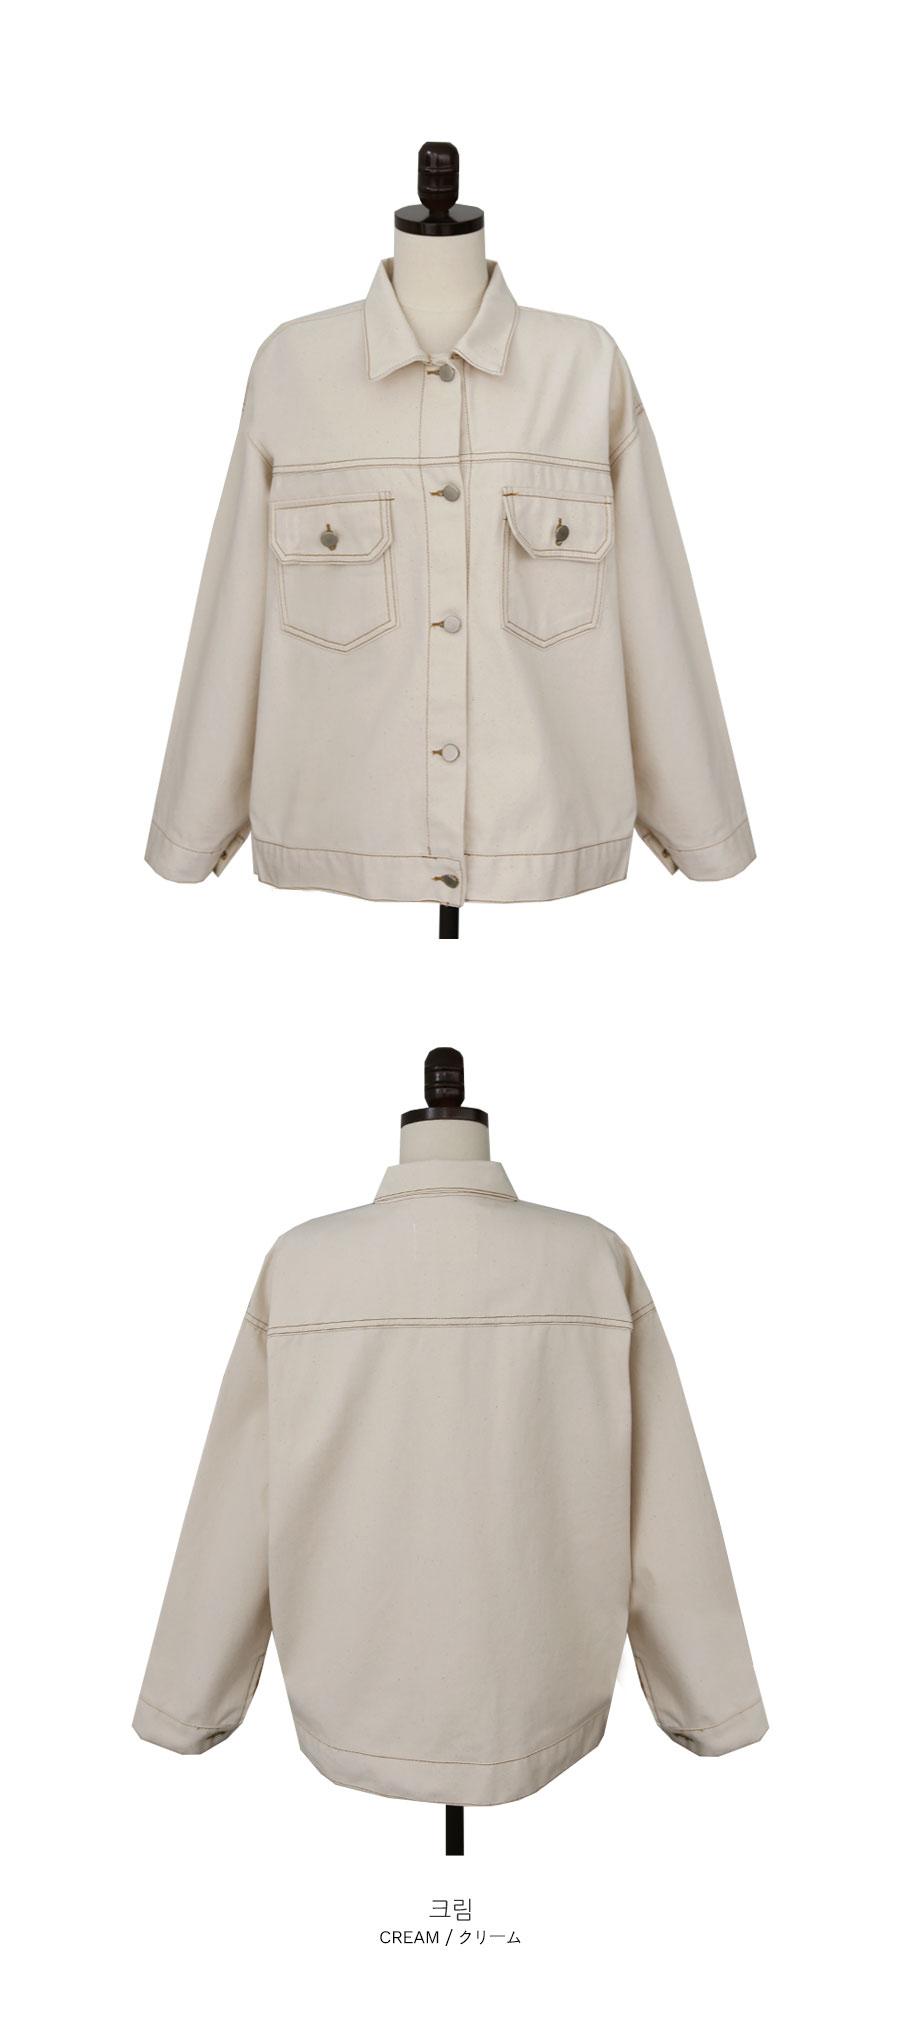 Thecream-cream cotton jacket